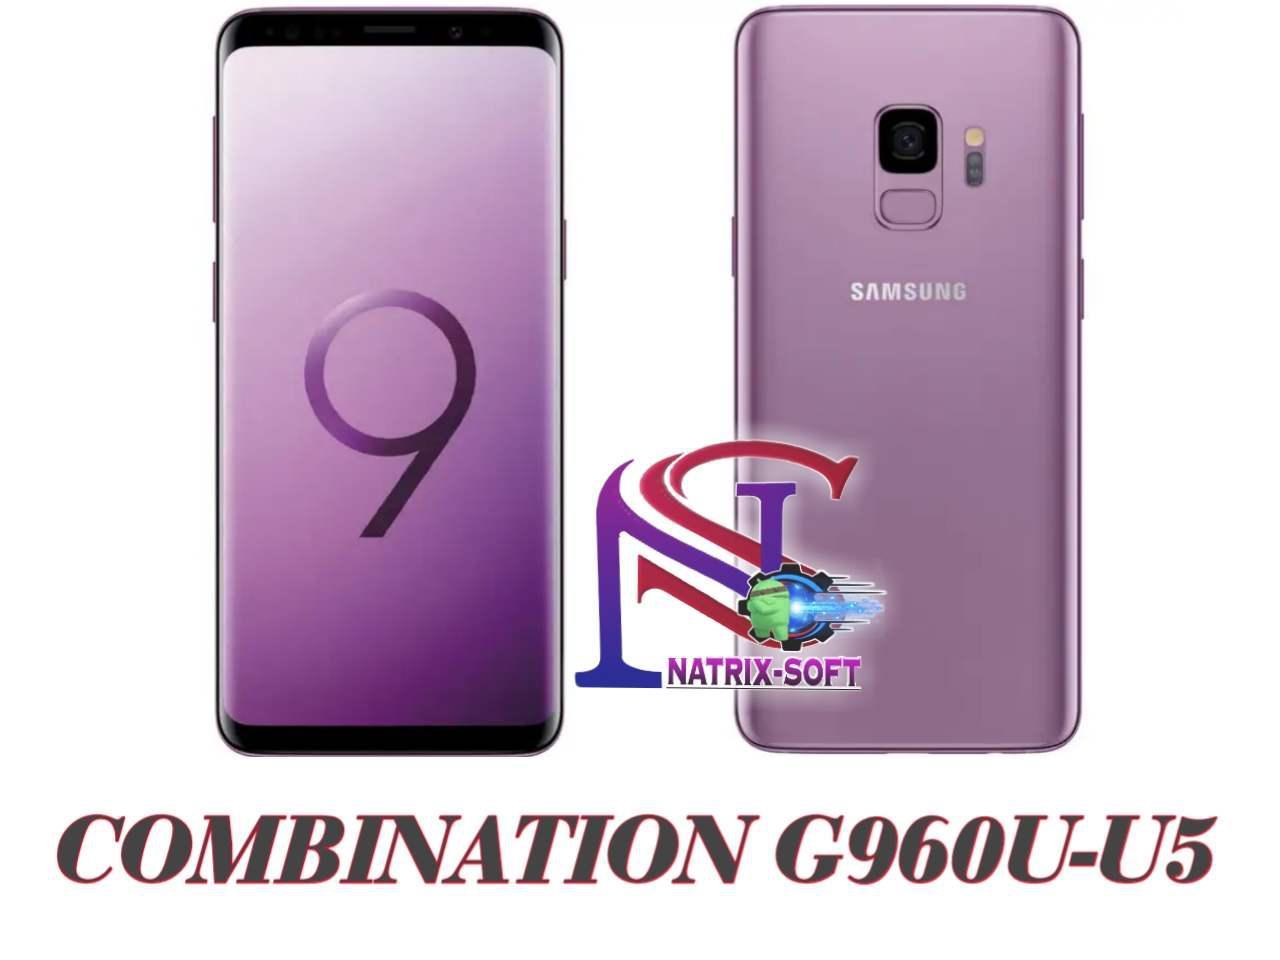 كومبنيشن G960U- U5 COMBINATION- S9